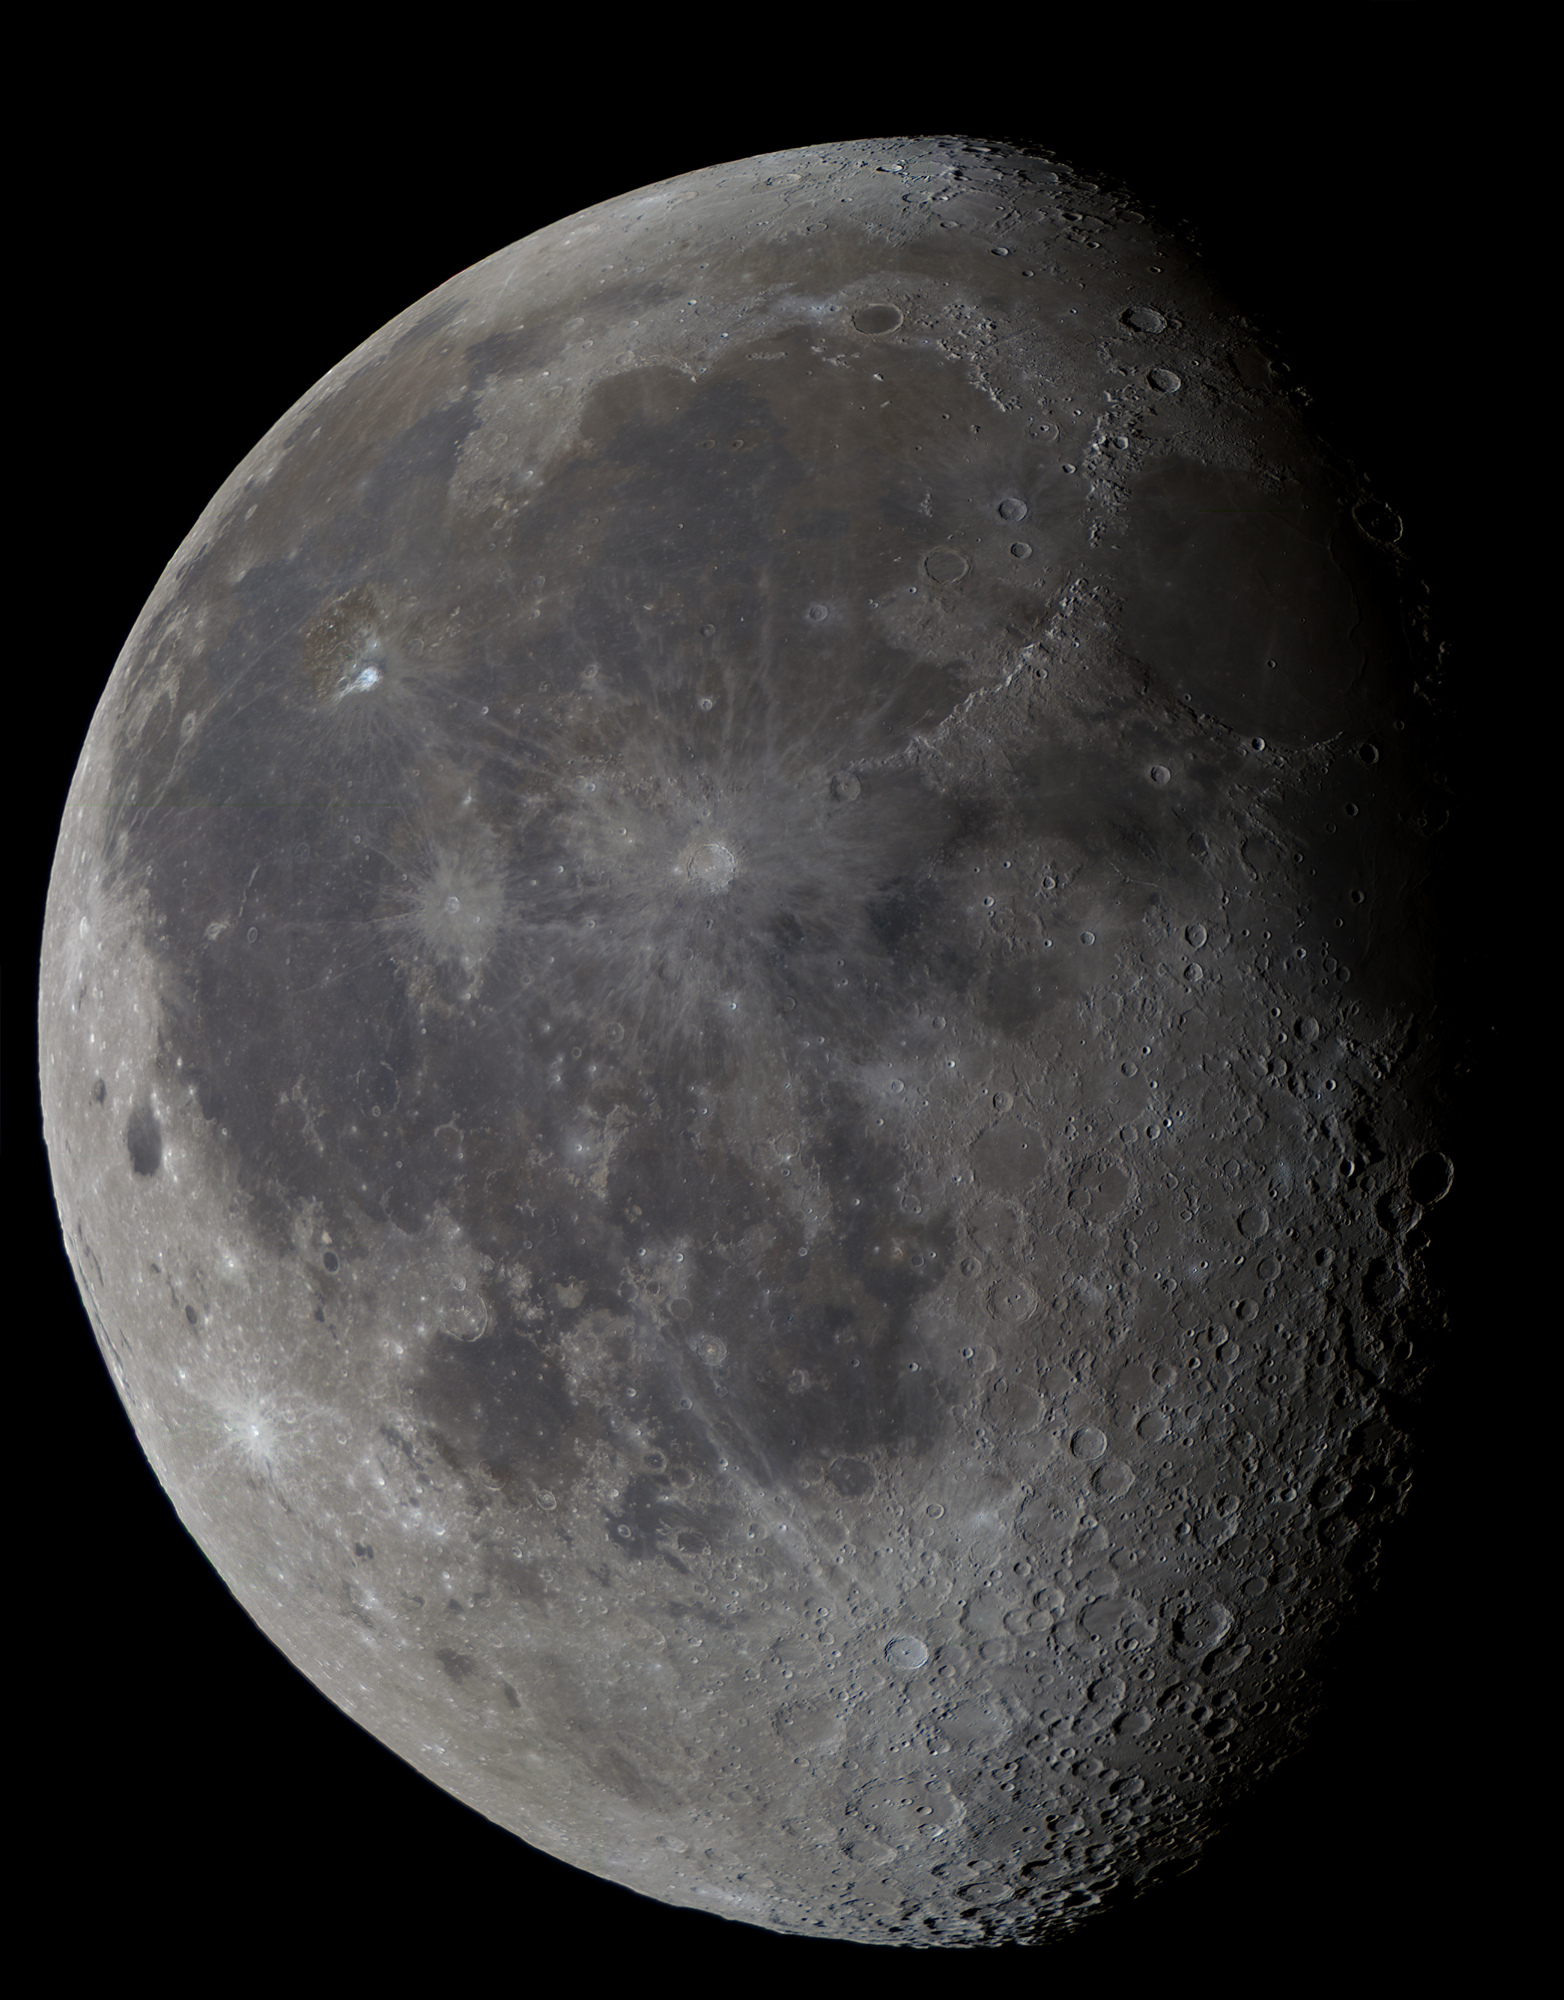 5dd1c10067eca_Moon_072656_171119_ZWOASI224MC_RGB_AS_P30_lapl4_ap172_stitch_finale.thumb.jpg.69e7c5ab698196ce58f3e0648c5a114f.jpg